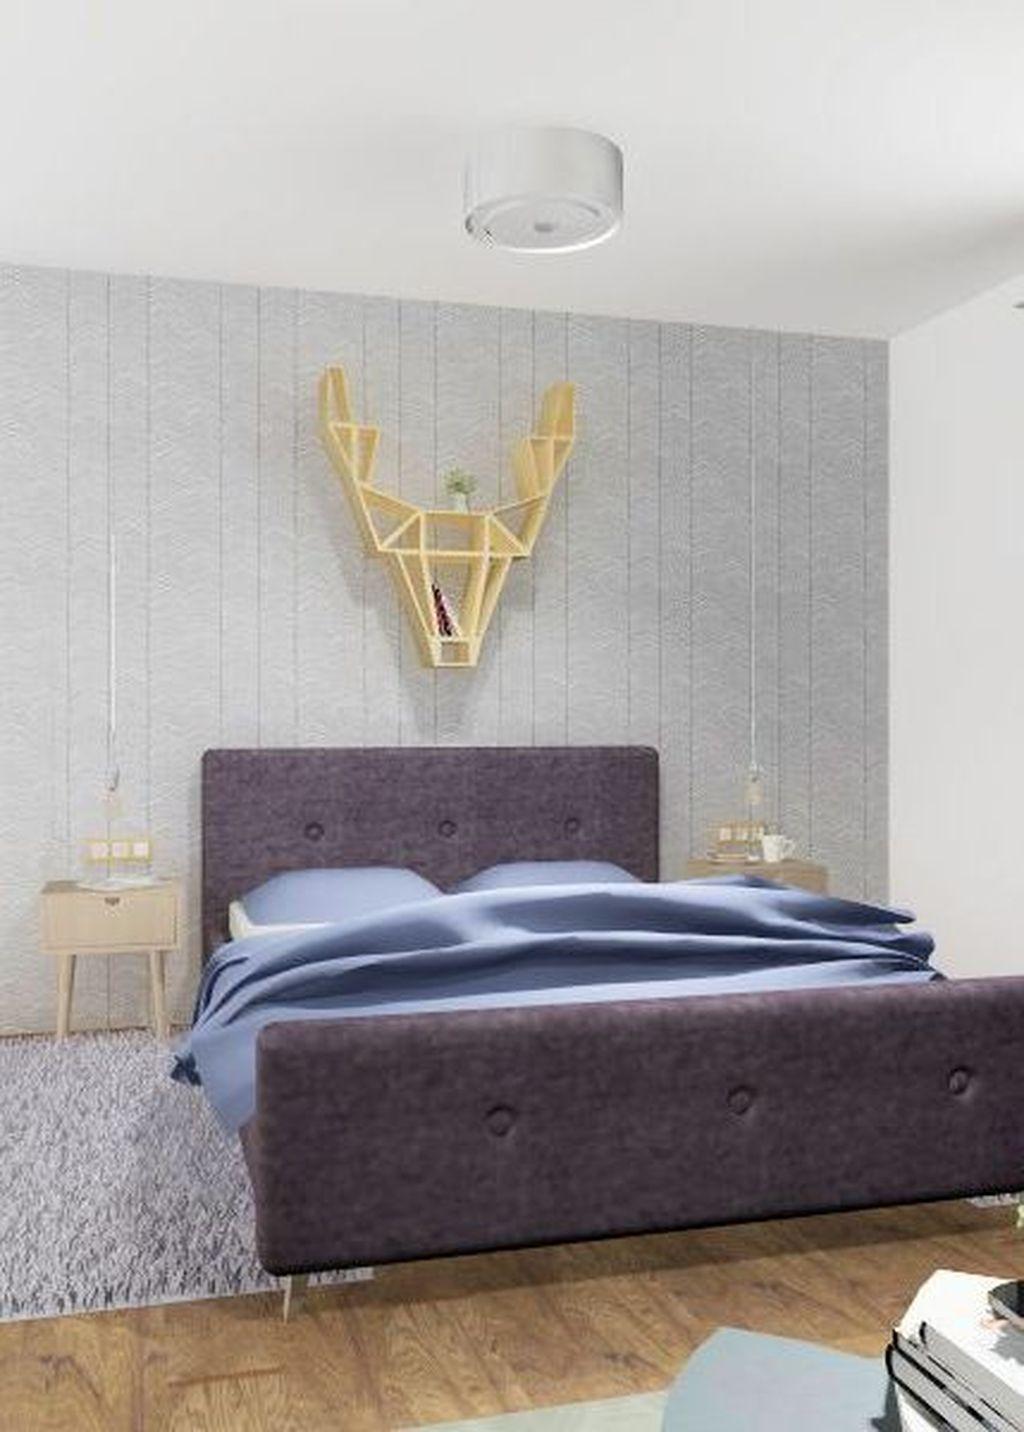 Splendid Deer Shelf Design Ideas With Minimalist Scandinavian Style To Try 29